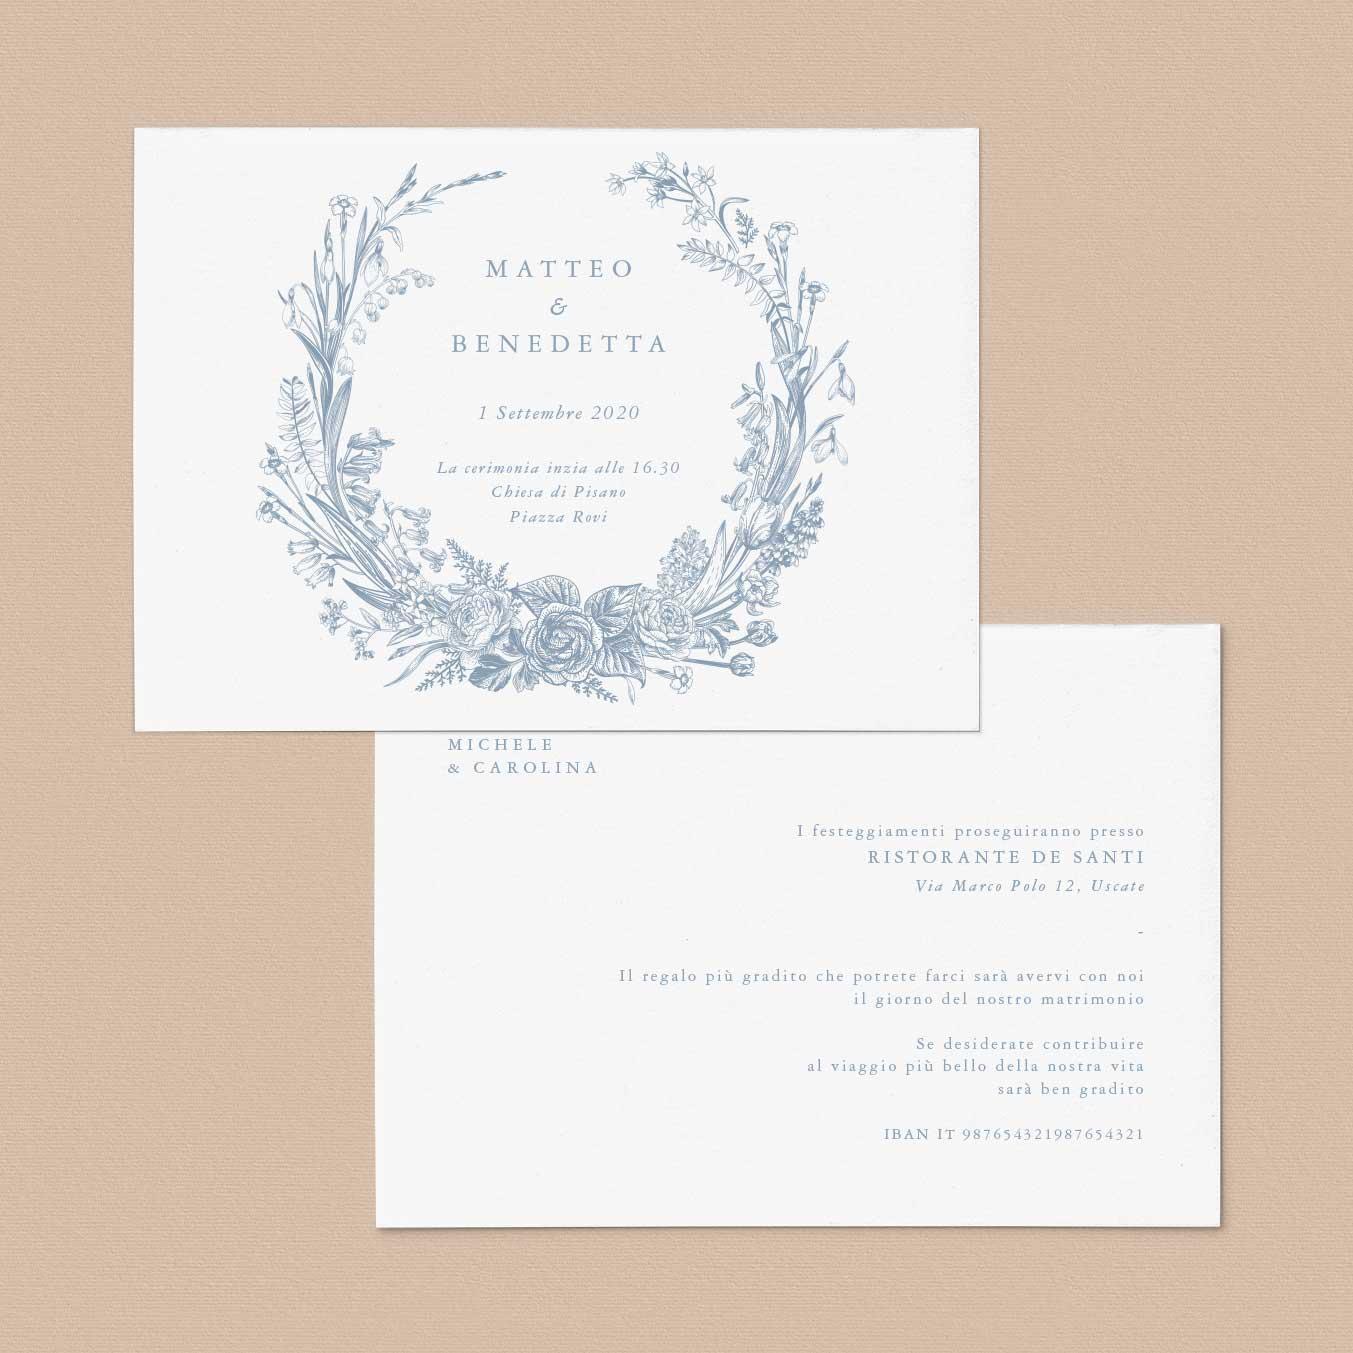 Partecipazioni-matrimonio-inviti-nozze-fiori-fiore-ghirlanda-ghirlande-fiore-tema-disegno-illustrazione-online-rose-classico-elegante